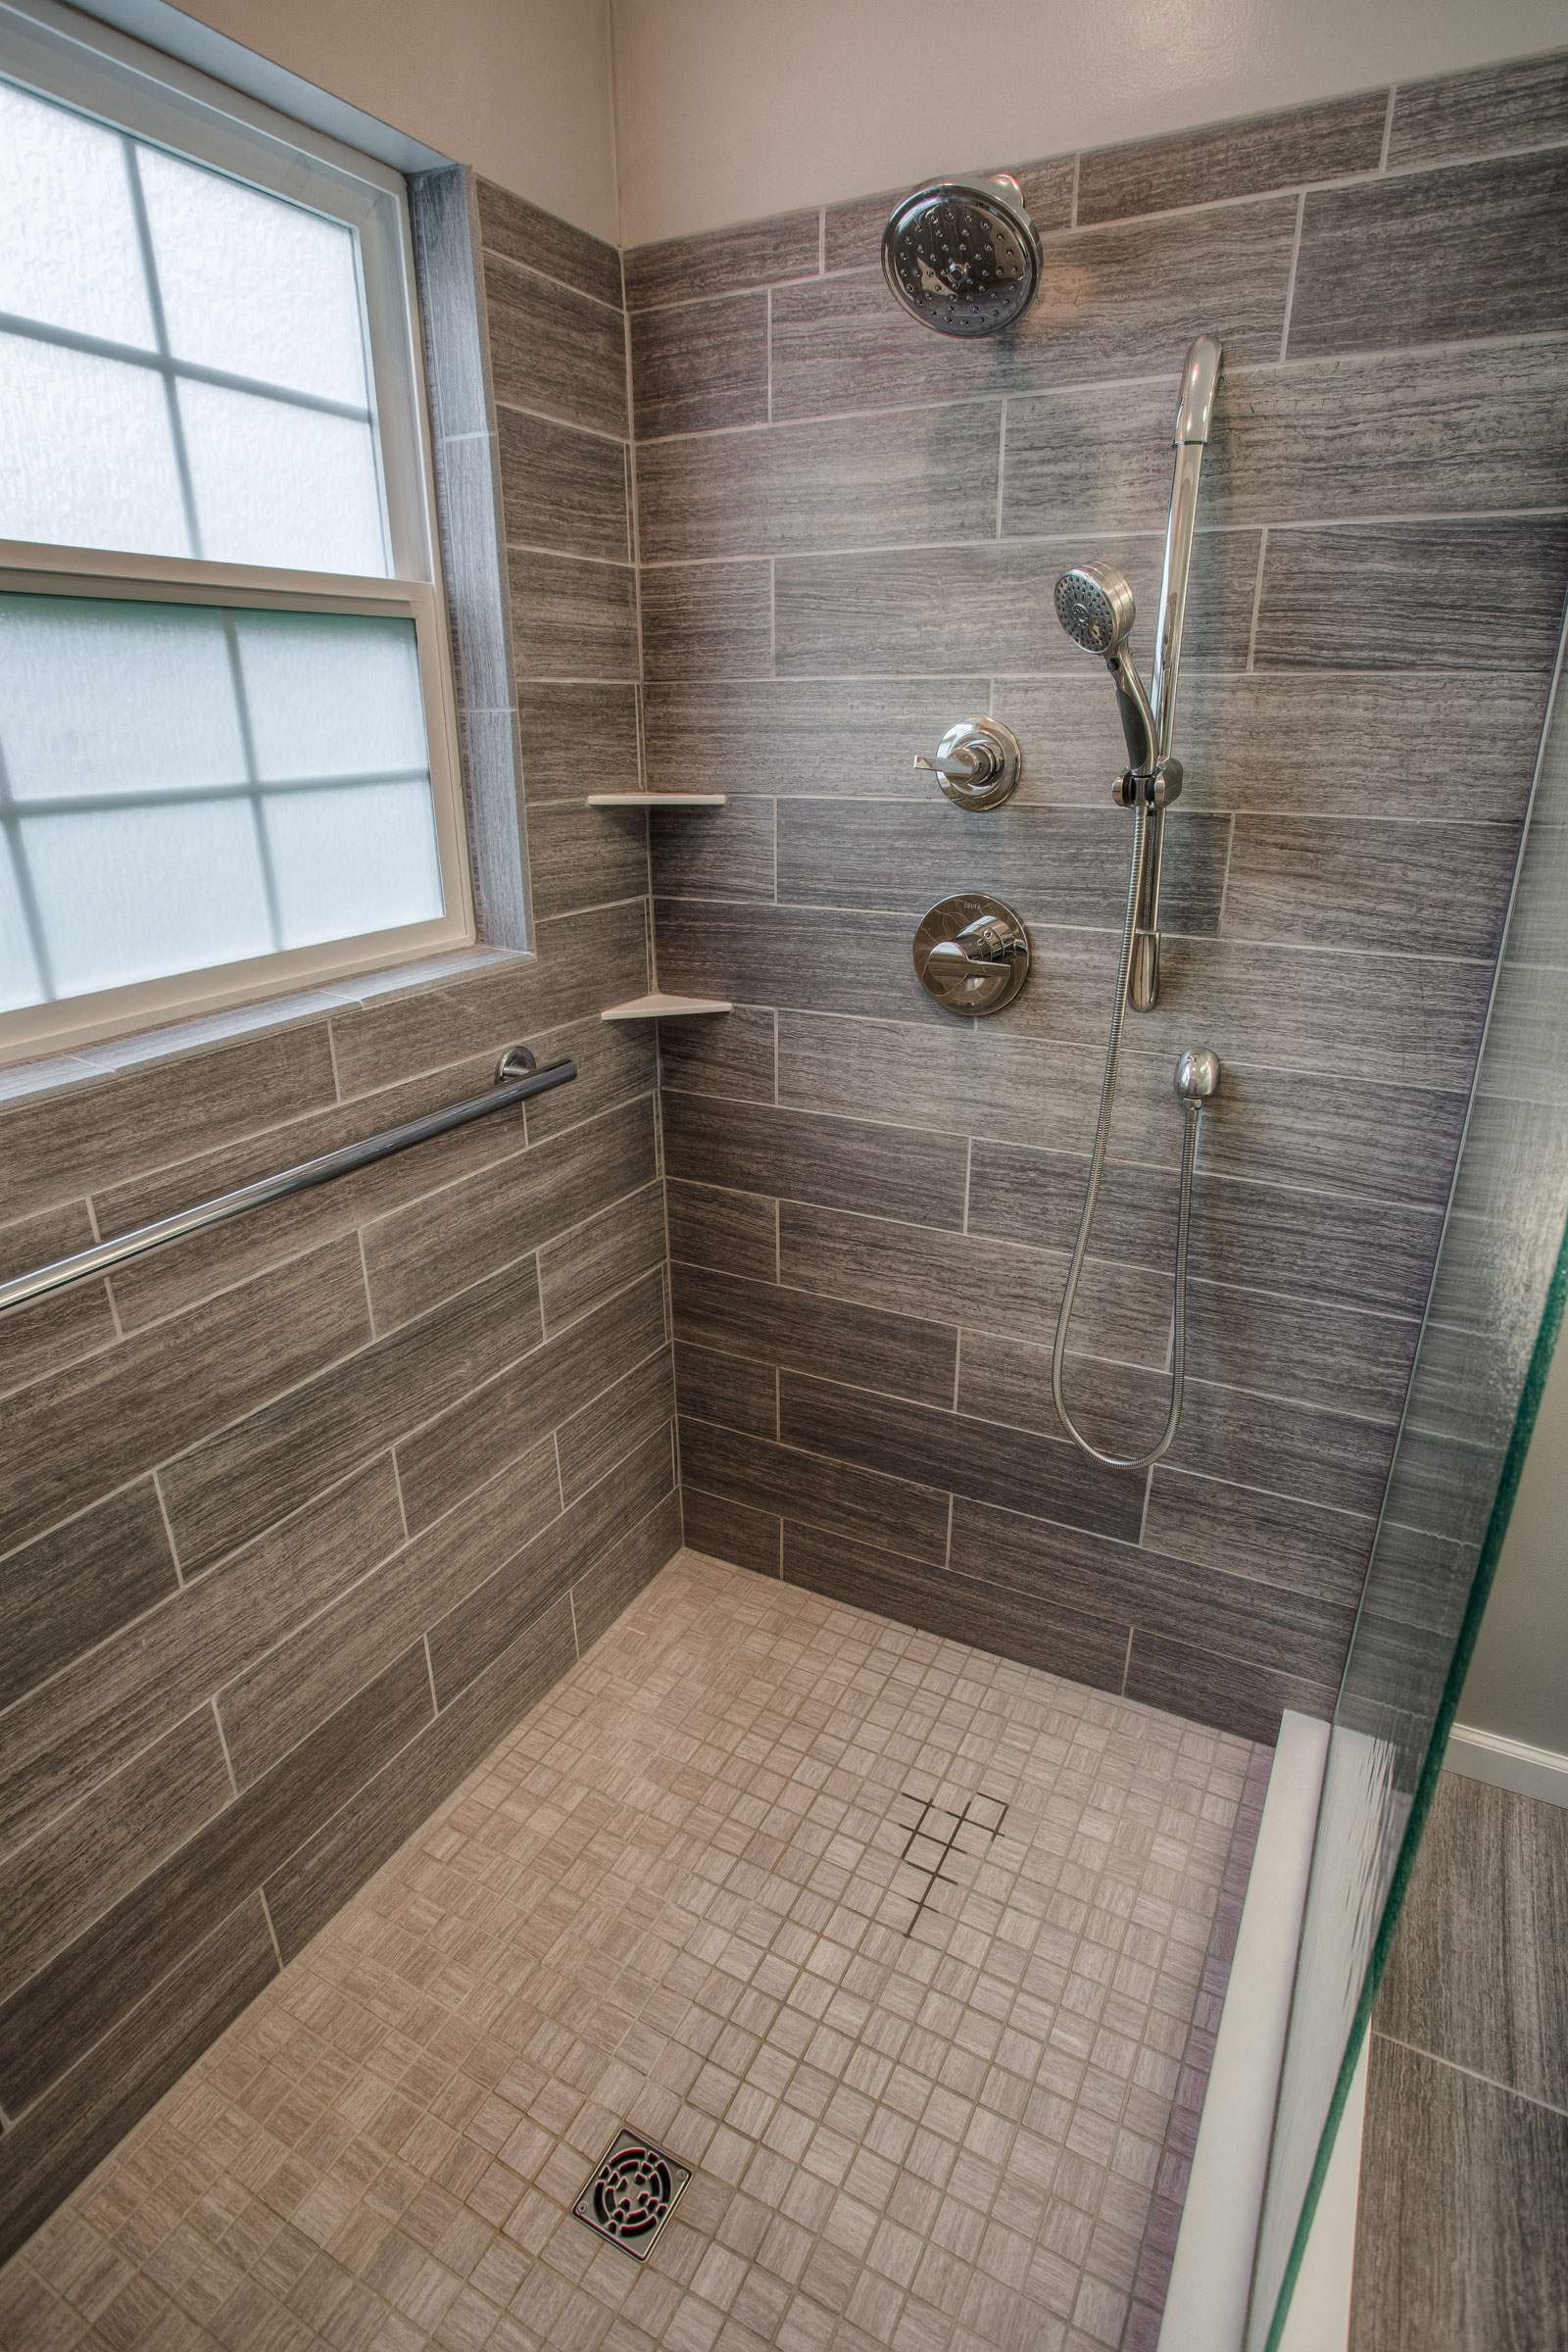 West Lafayette Contemporary Master Bathroom Remodel ... on Modern Small Bathroom Remodel  id=15322